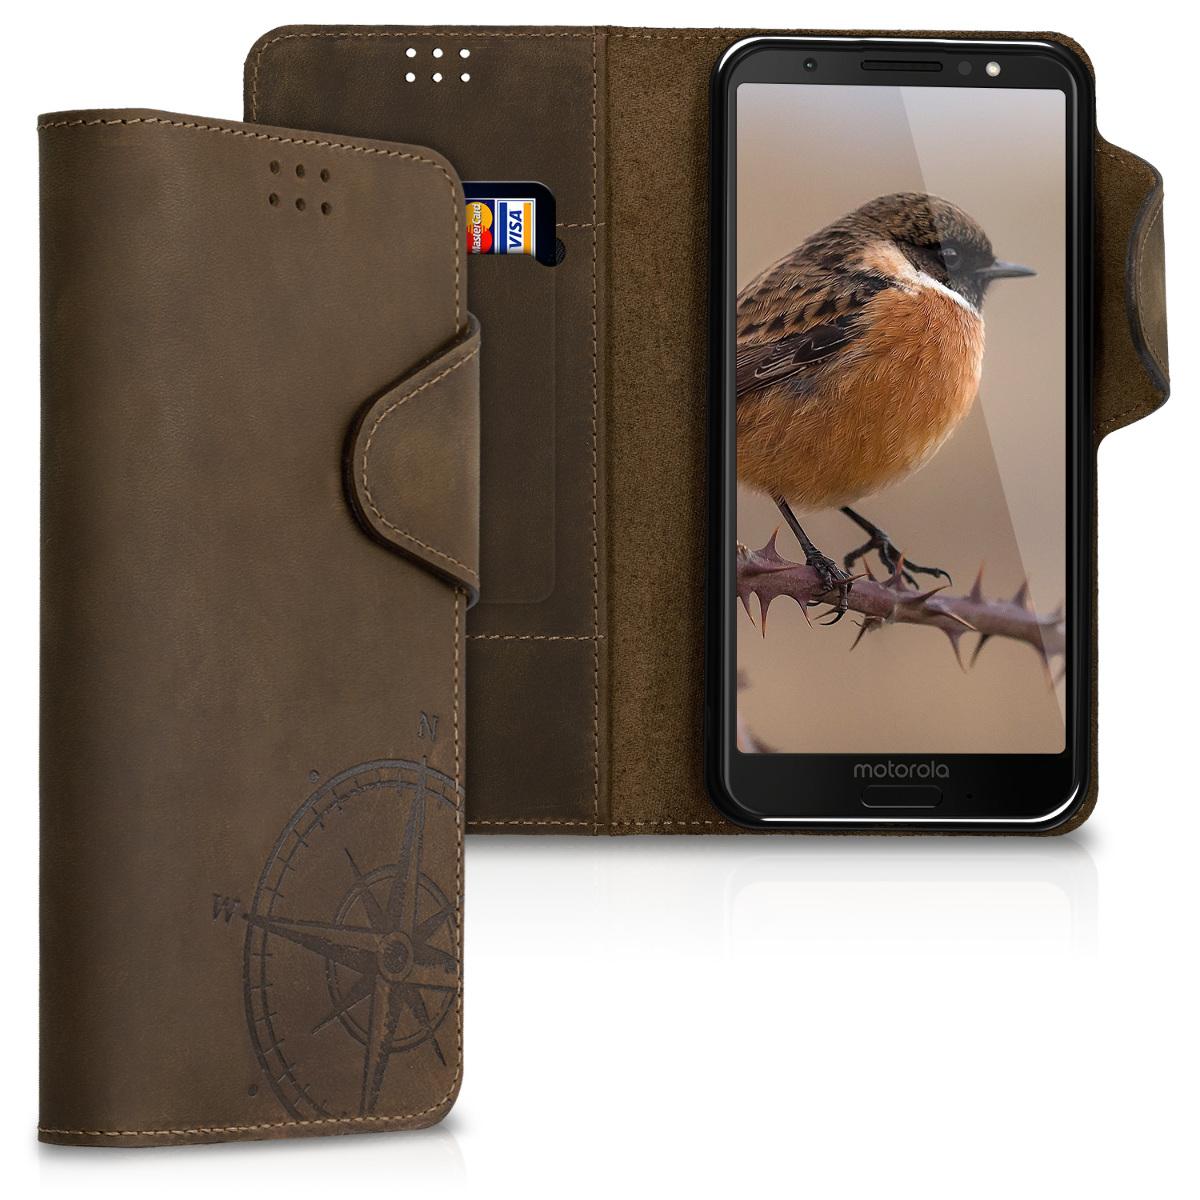 Kalibri Δερμάτινη Suede Θήκη Πορτοφόλι Motorola Moto G6 - Brown (48763.01)